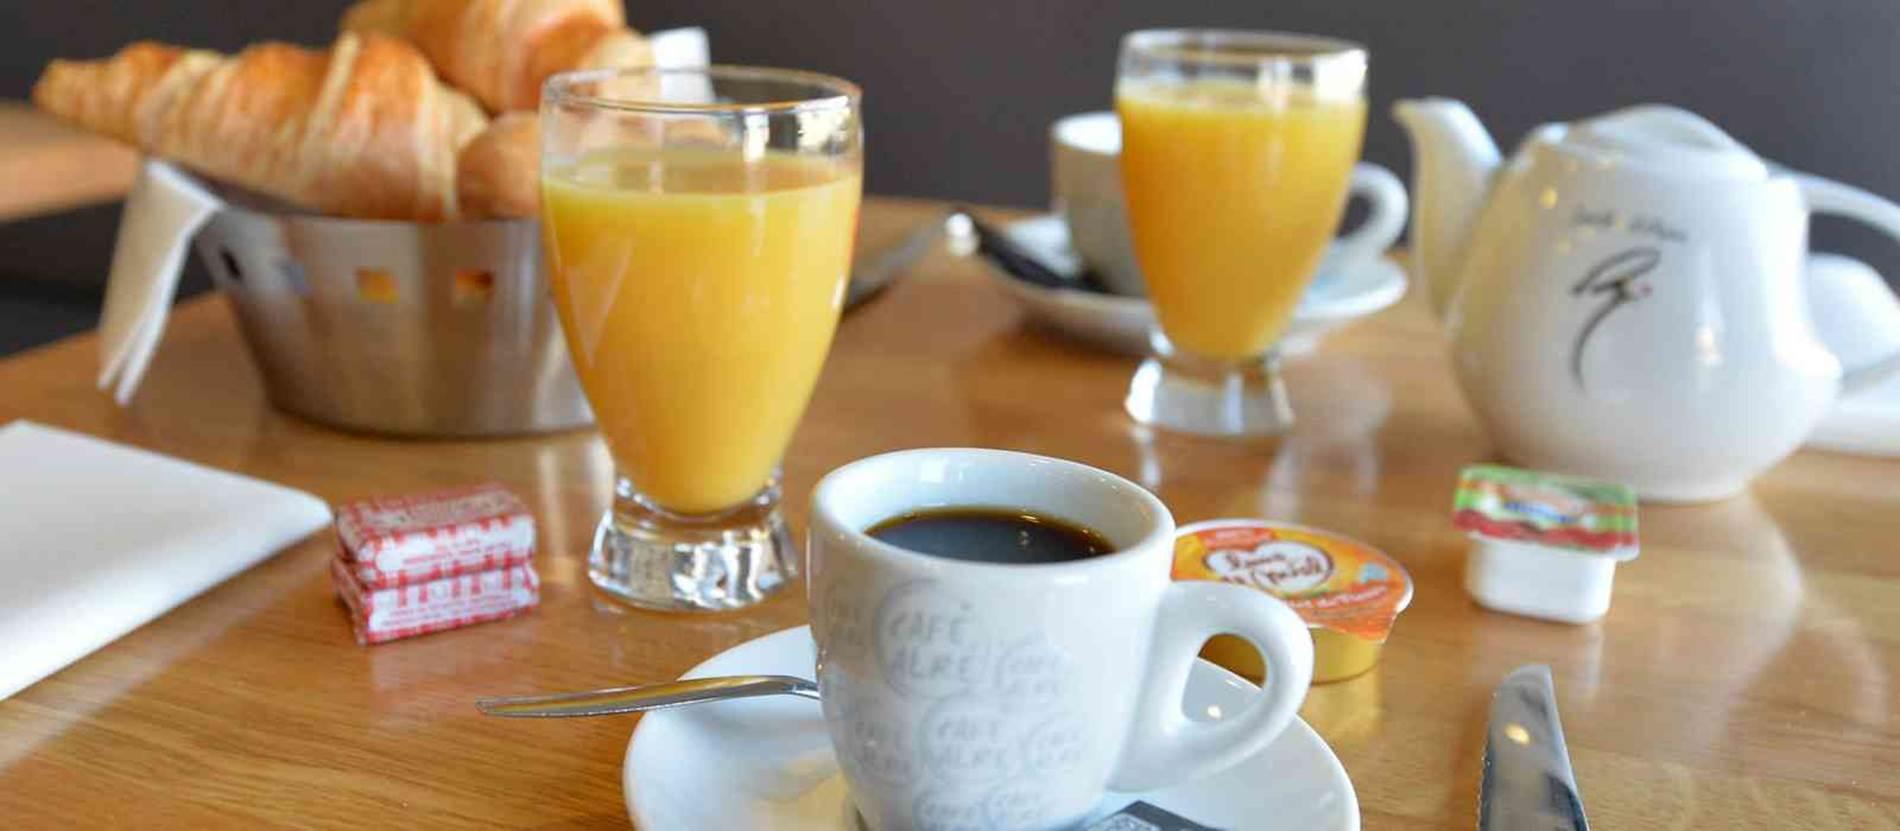 hotel-ibis-styles-vannes-petit-déjeuner © hotel-ibis-styles